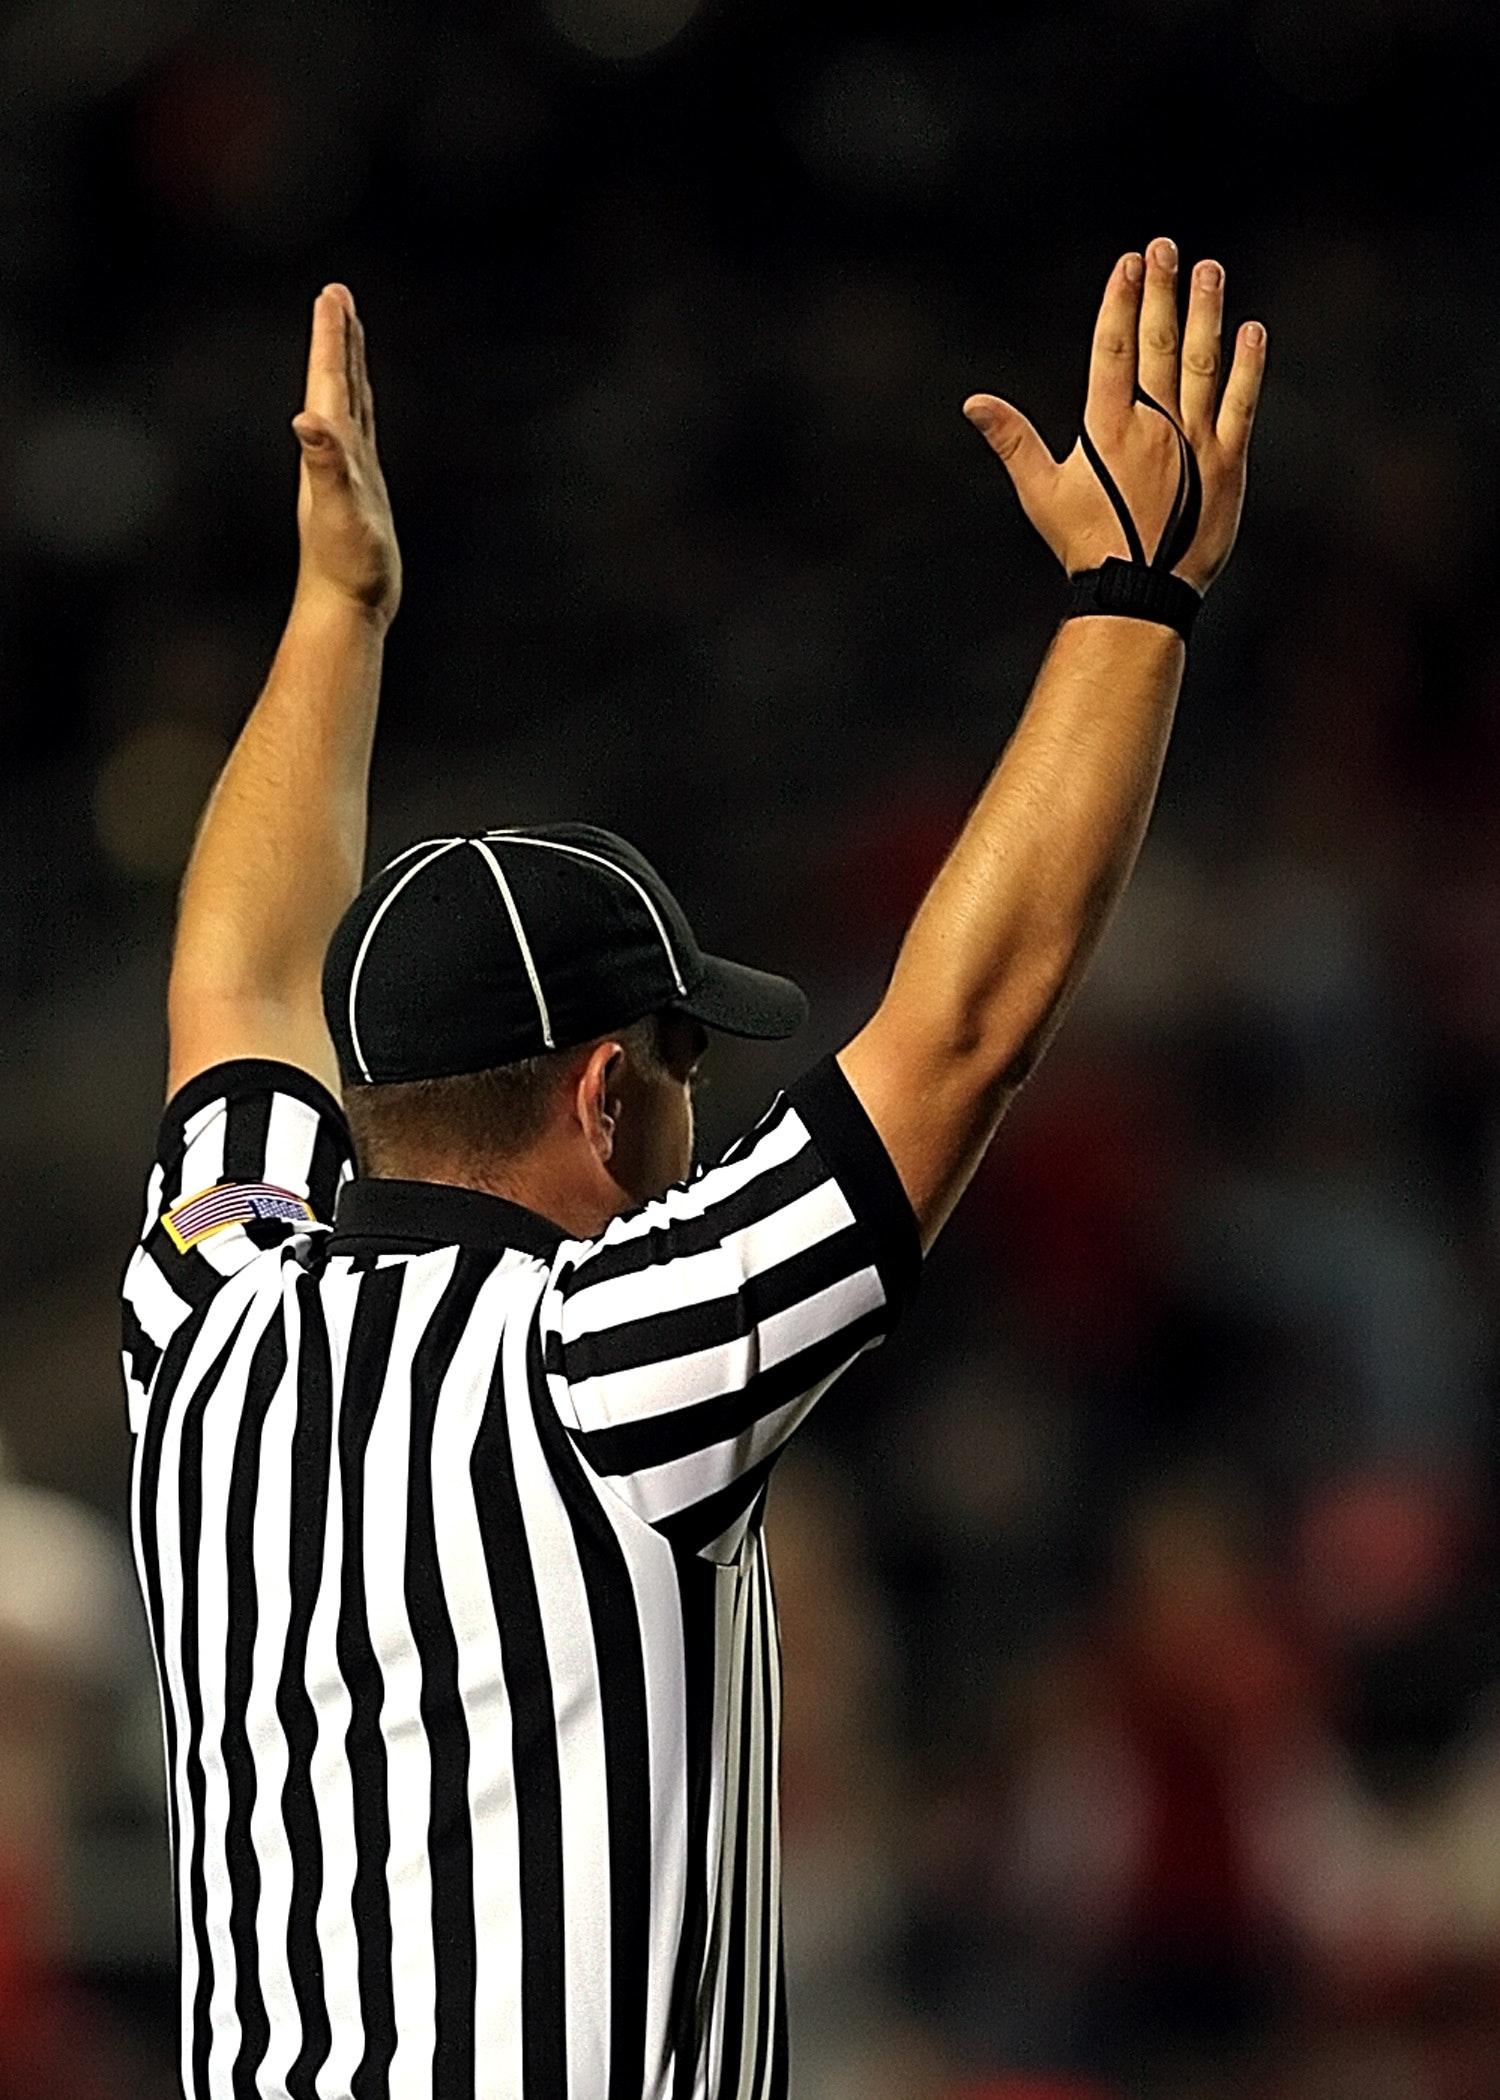 Referee raising both hands photo